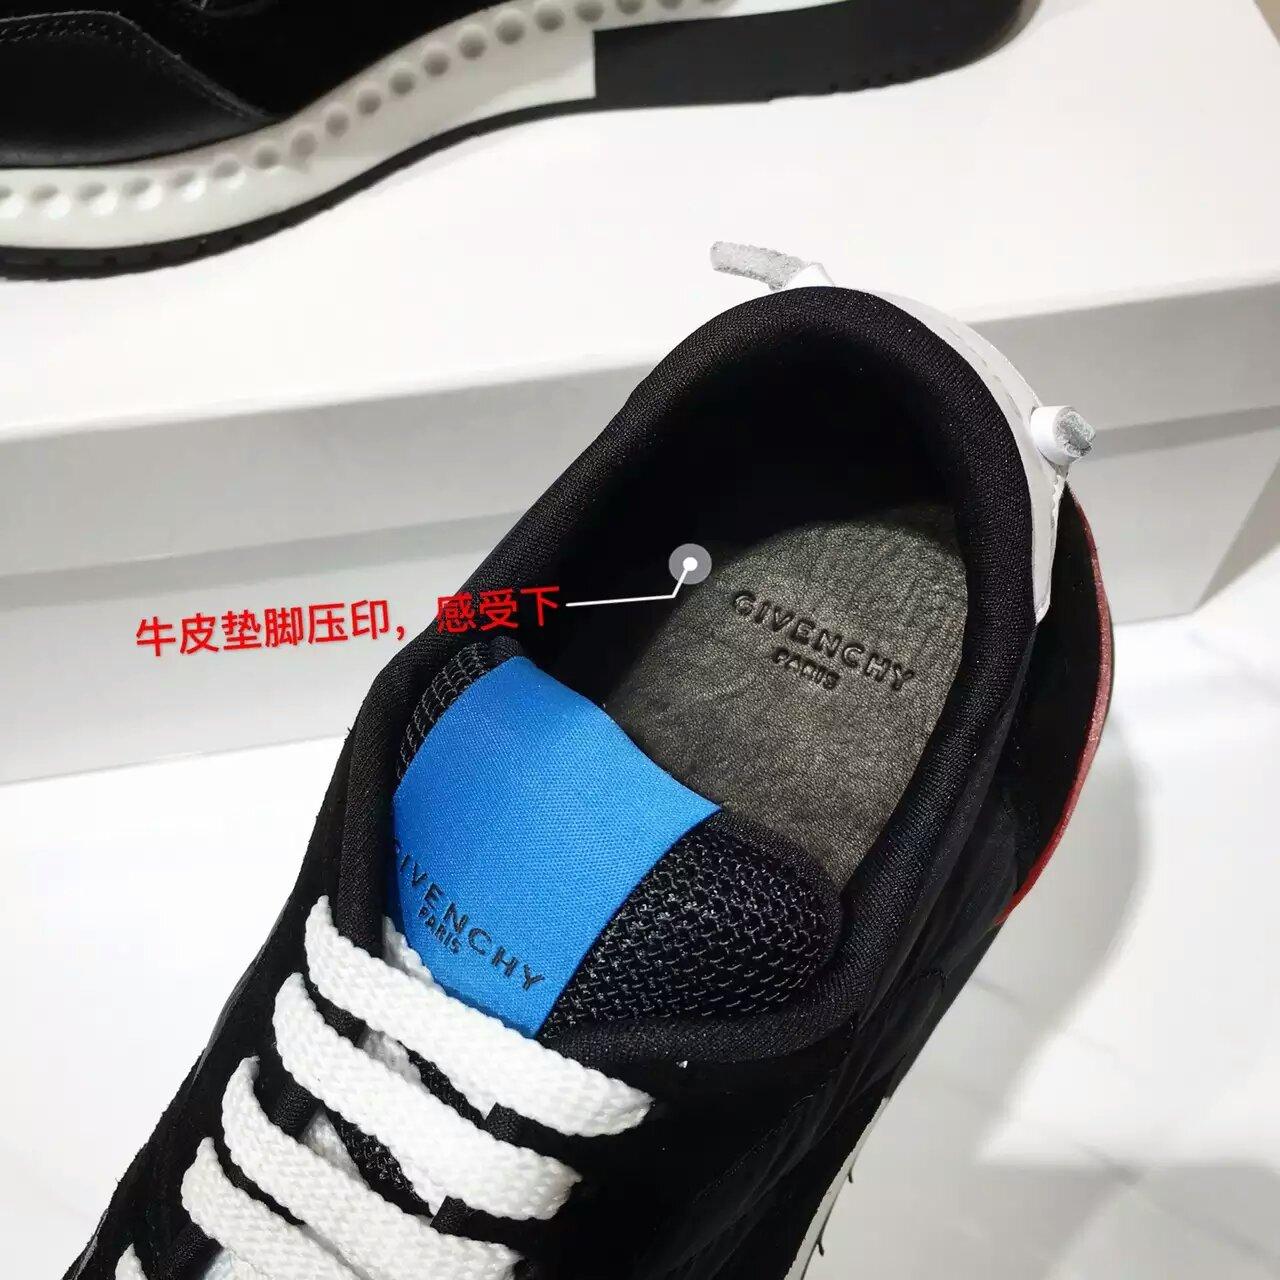 【Givenchy】最高版本原单品质男士运动休闲鞋